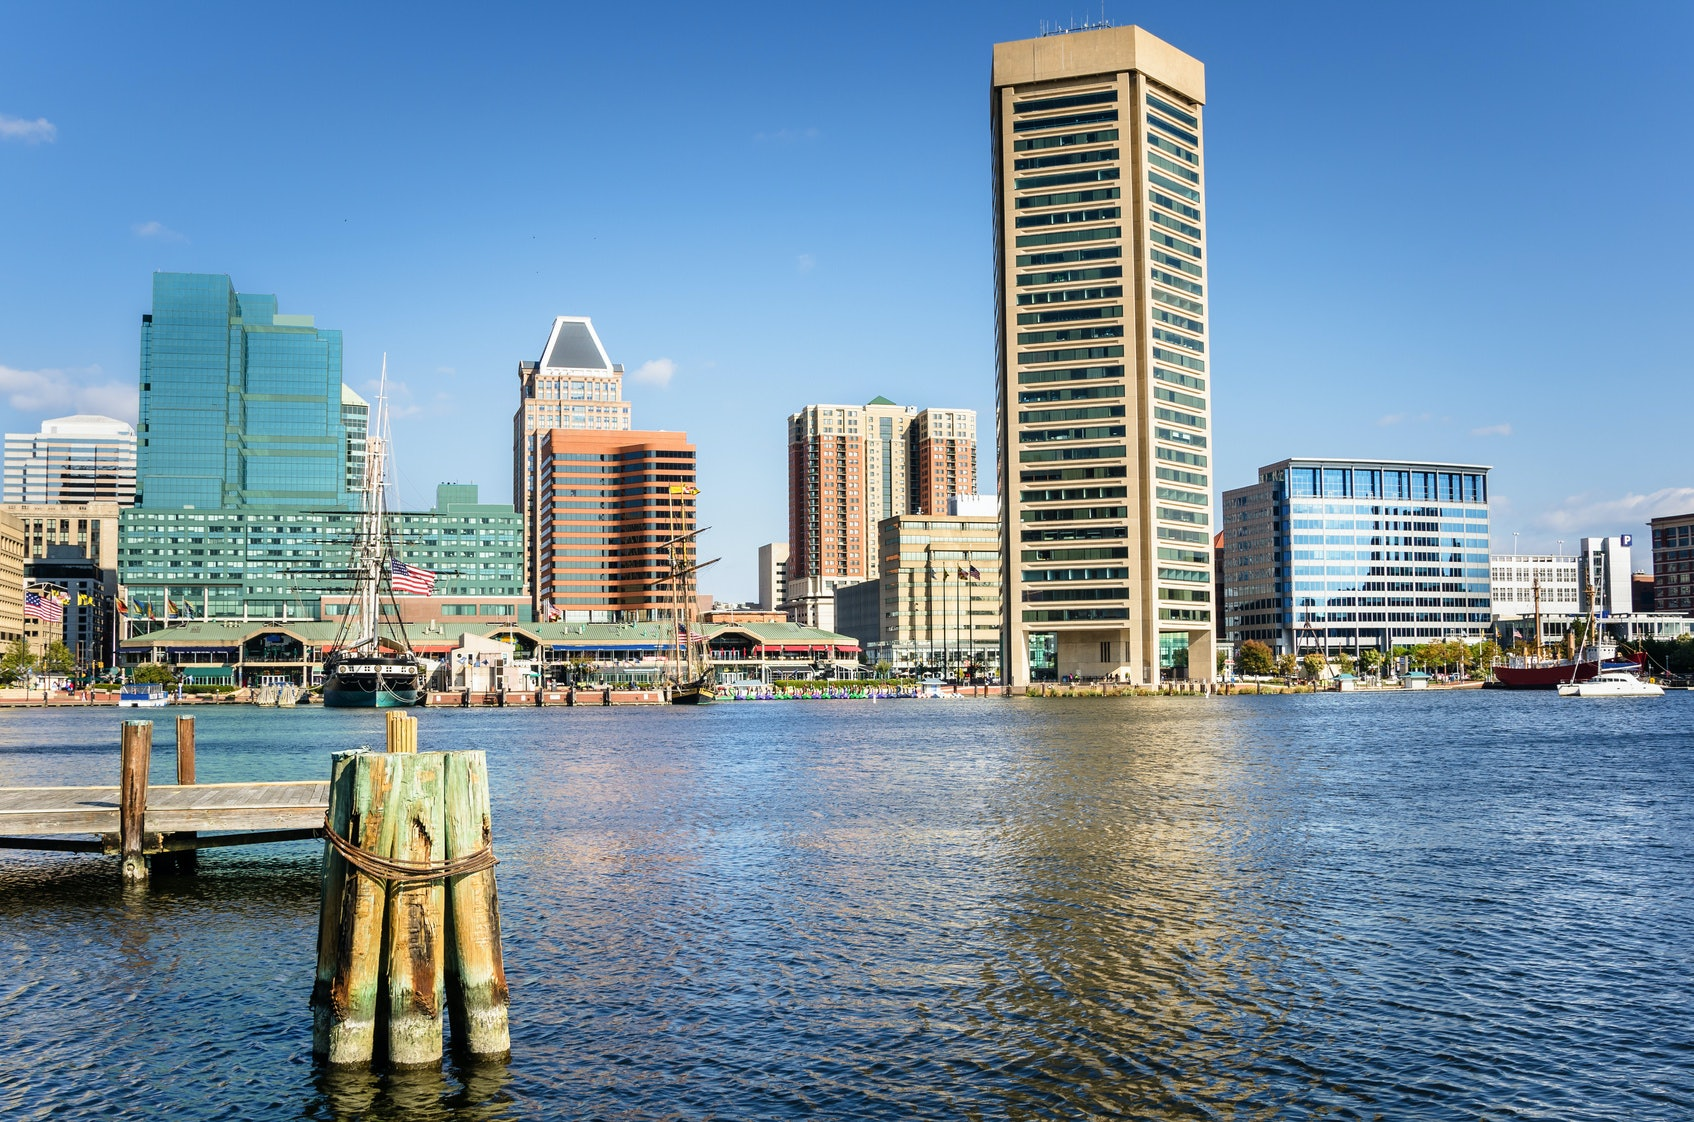 The Top 10 U.S. Summer Travel Destinations, According To TripAdvisor